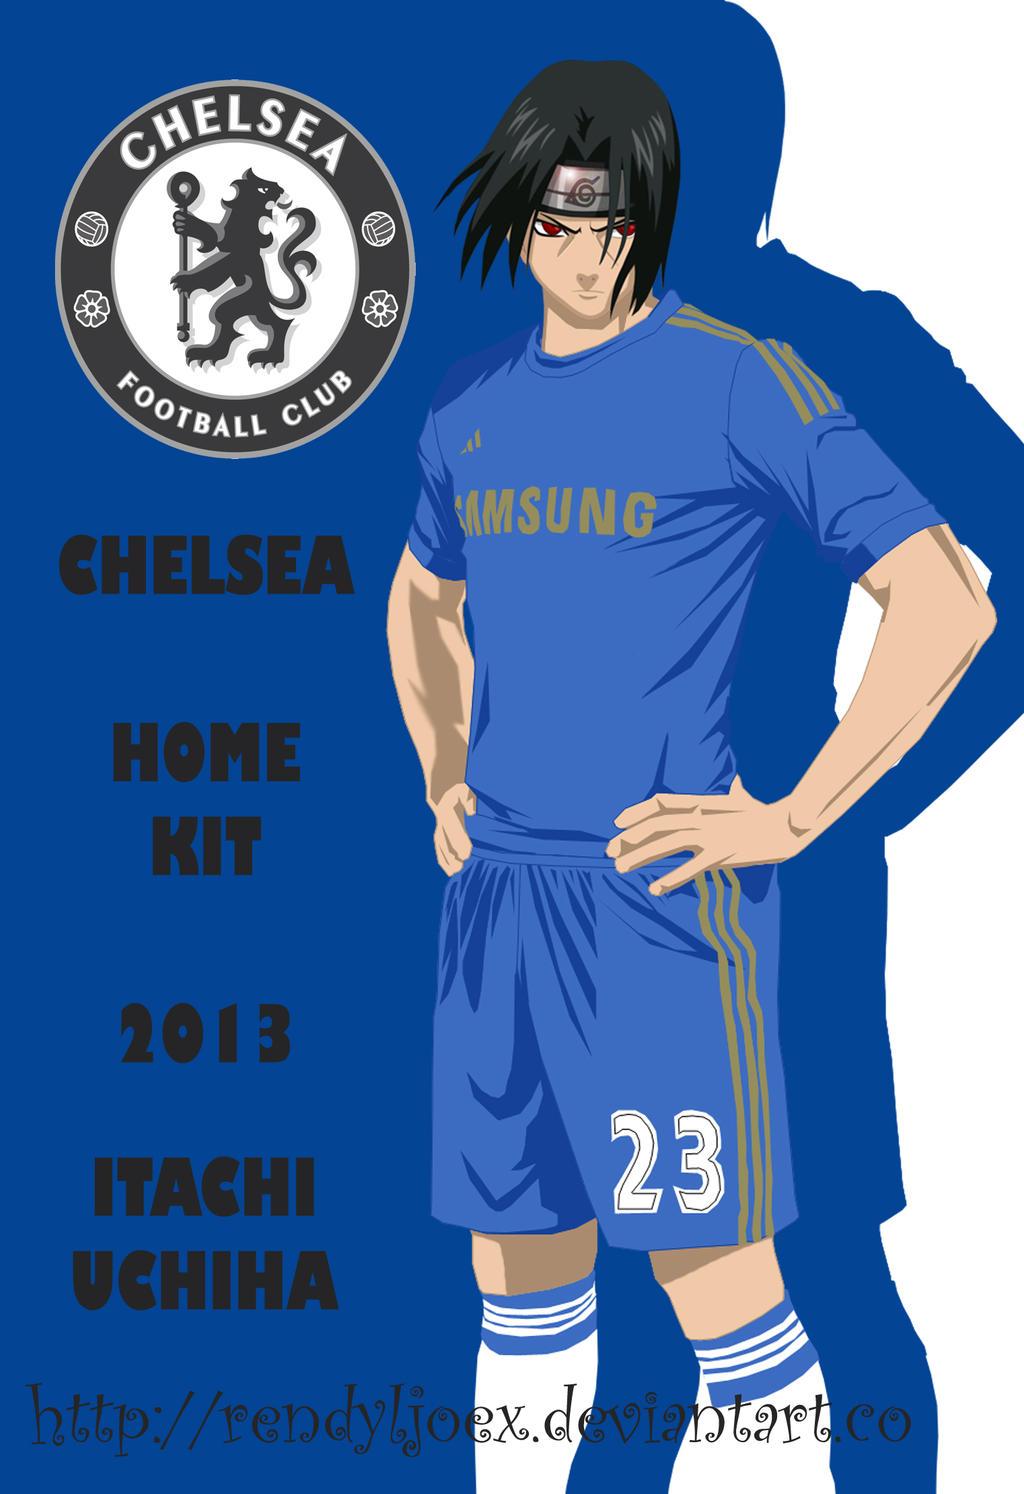 Chelsea home kit 2013 by rendyljoex on deviantart itachi chelsea home kit 2013 by rendyljoex voltagebd Gallery